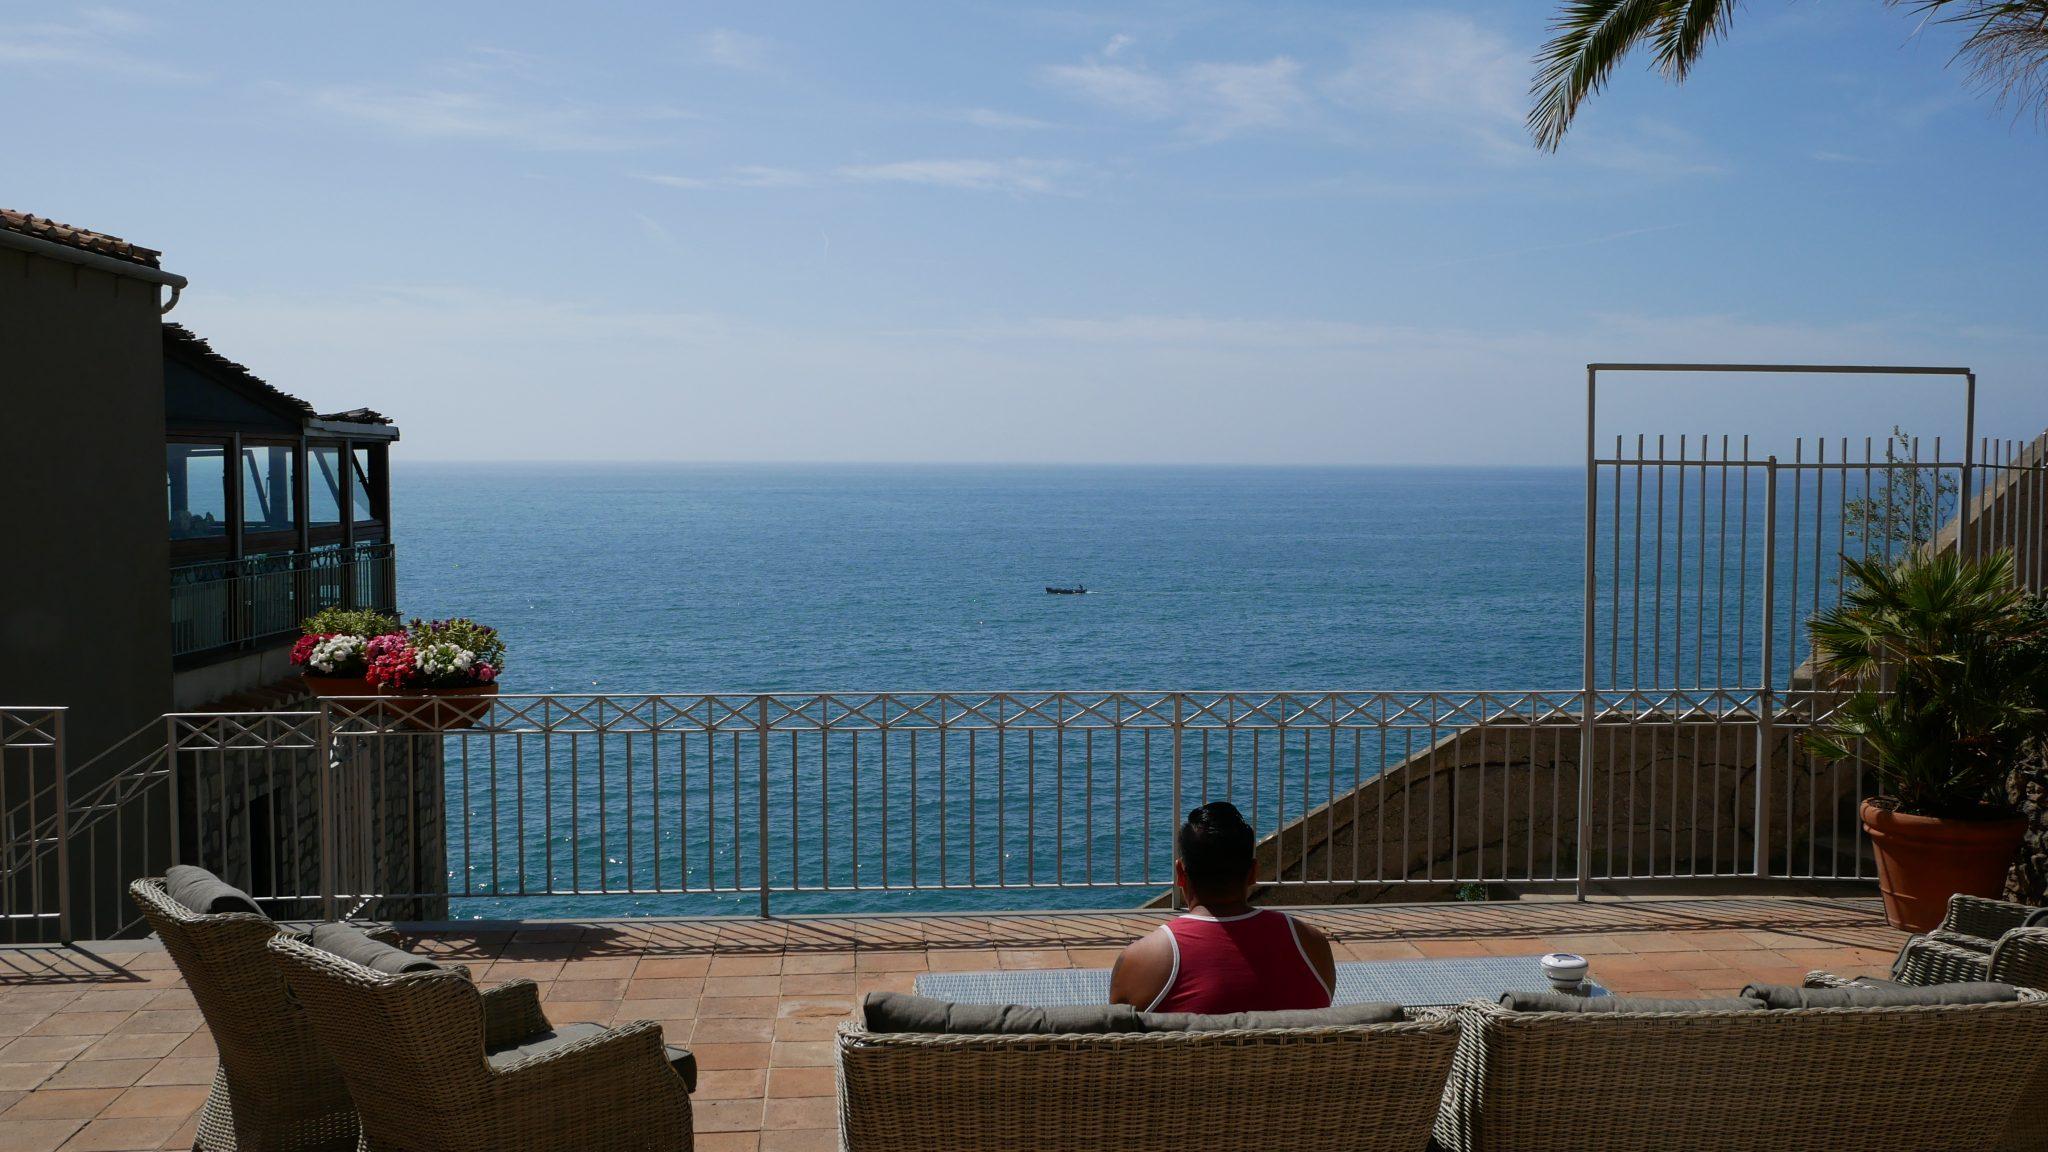 amalfi coast hotel marmorata welcome fittwotravel.com